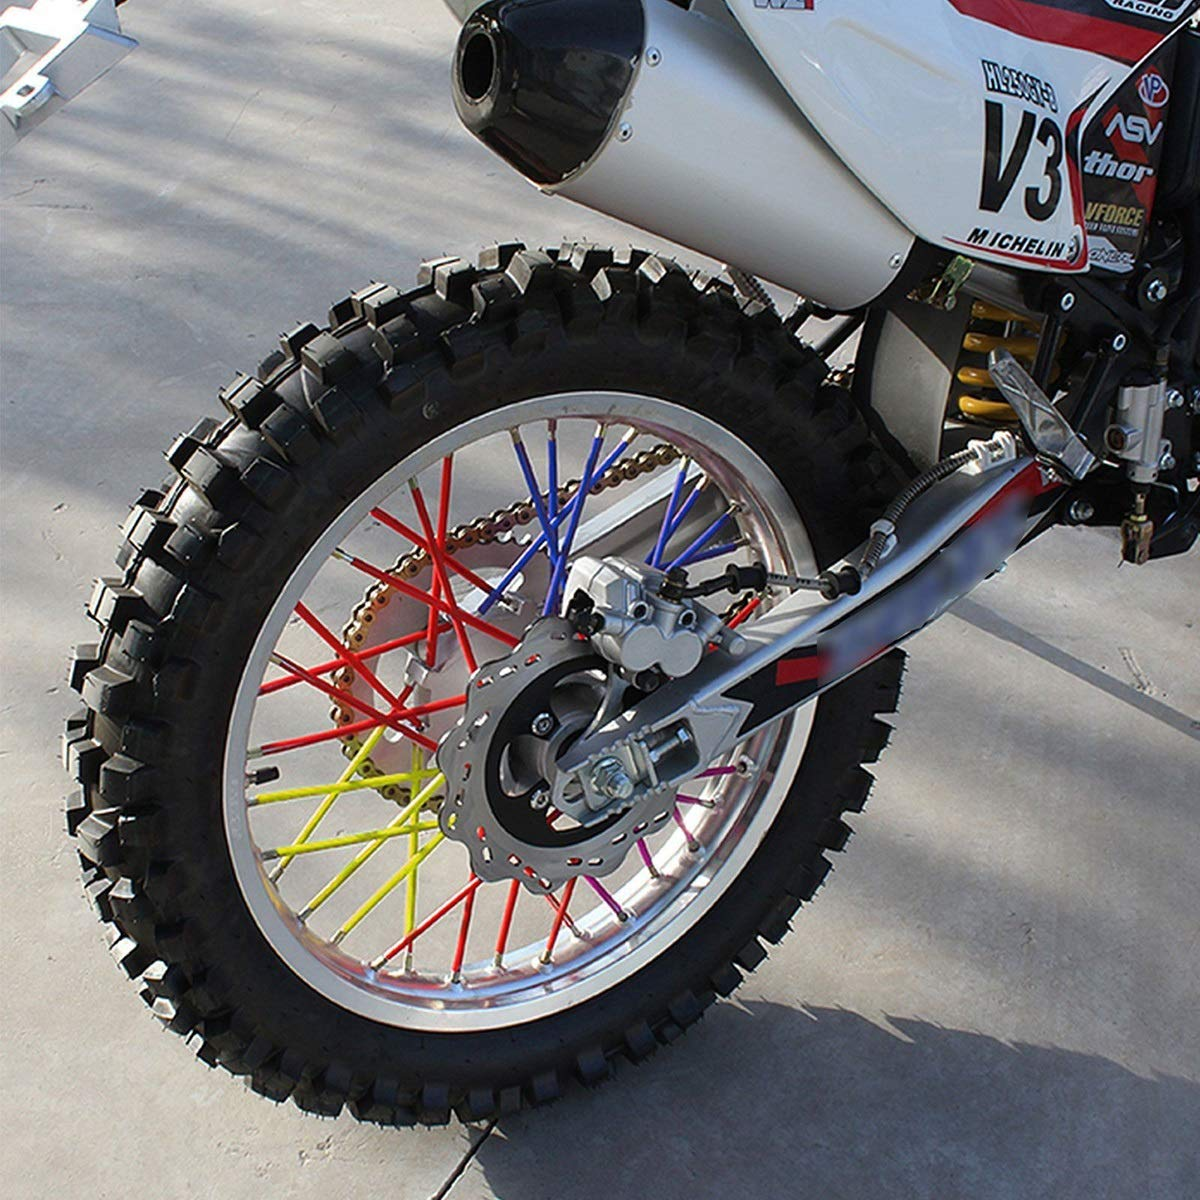 Color : Purple DEALPEAK 72PCS Spoke Skins Covers for Motocross Dirt Bike Wheel Rim Guard Protector Wraps